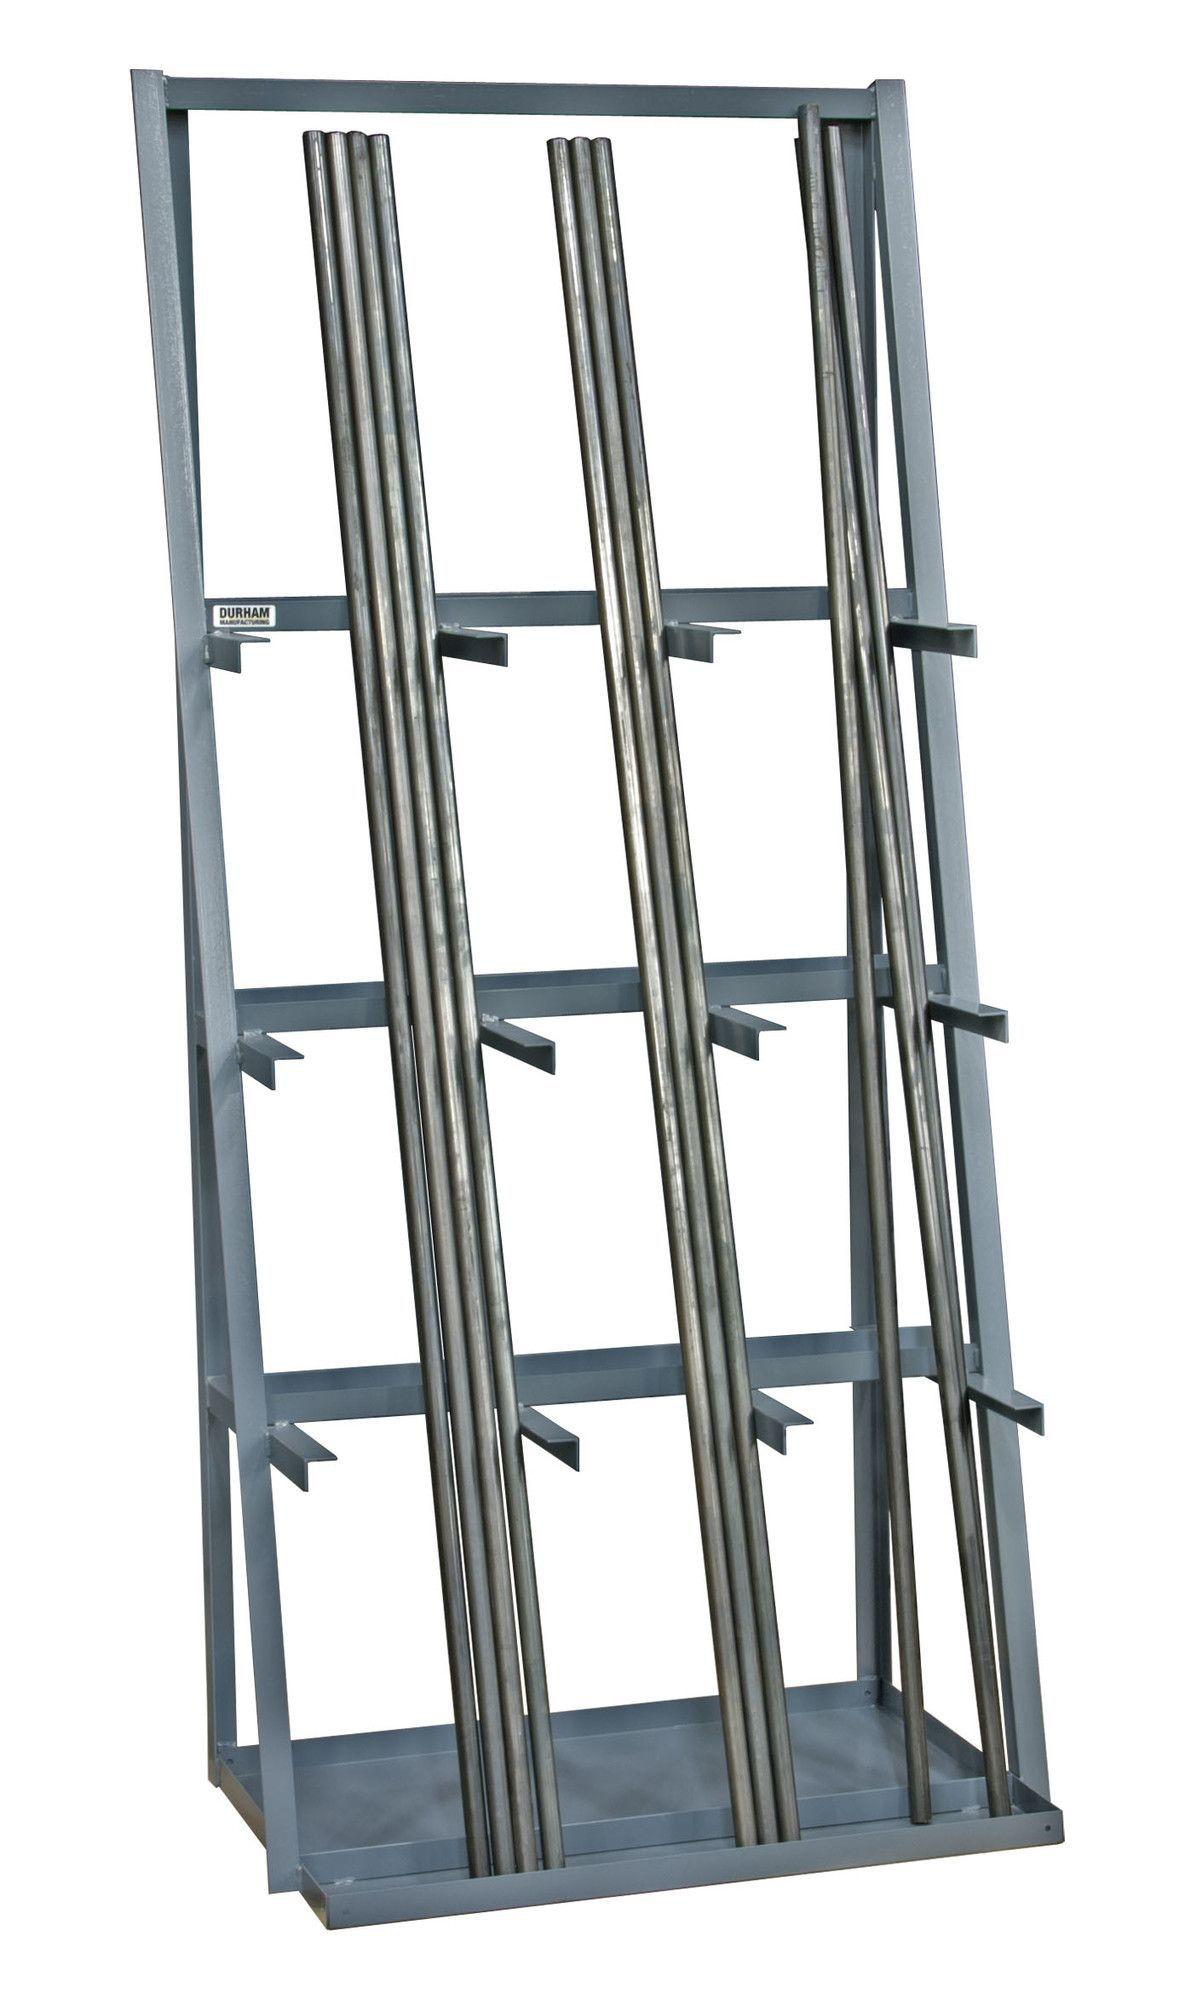 Durham Manufacturing 14 Gauge Steel Vertical Long Parts Storage Rack Welding Table Metal Storage Racks Welding Projects